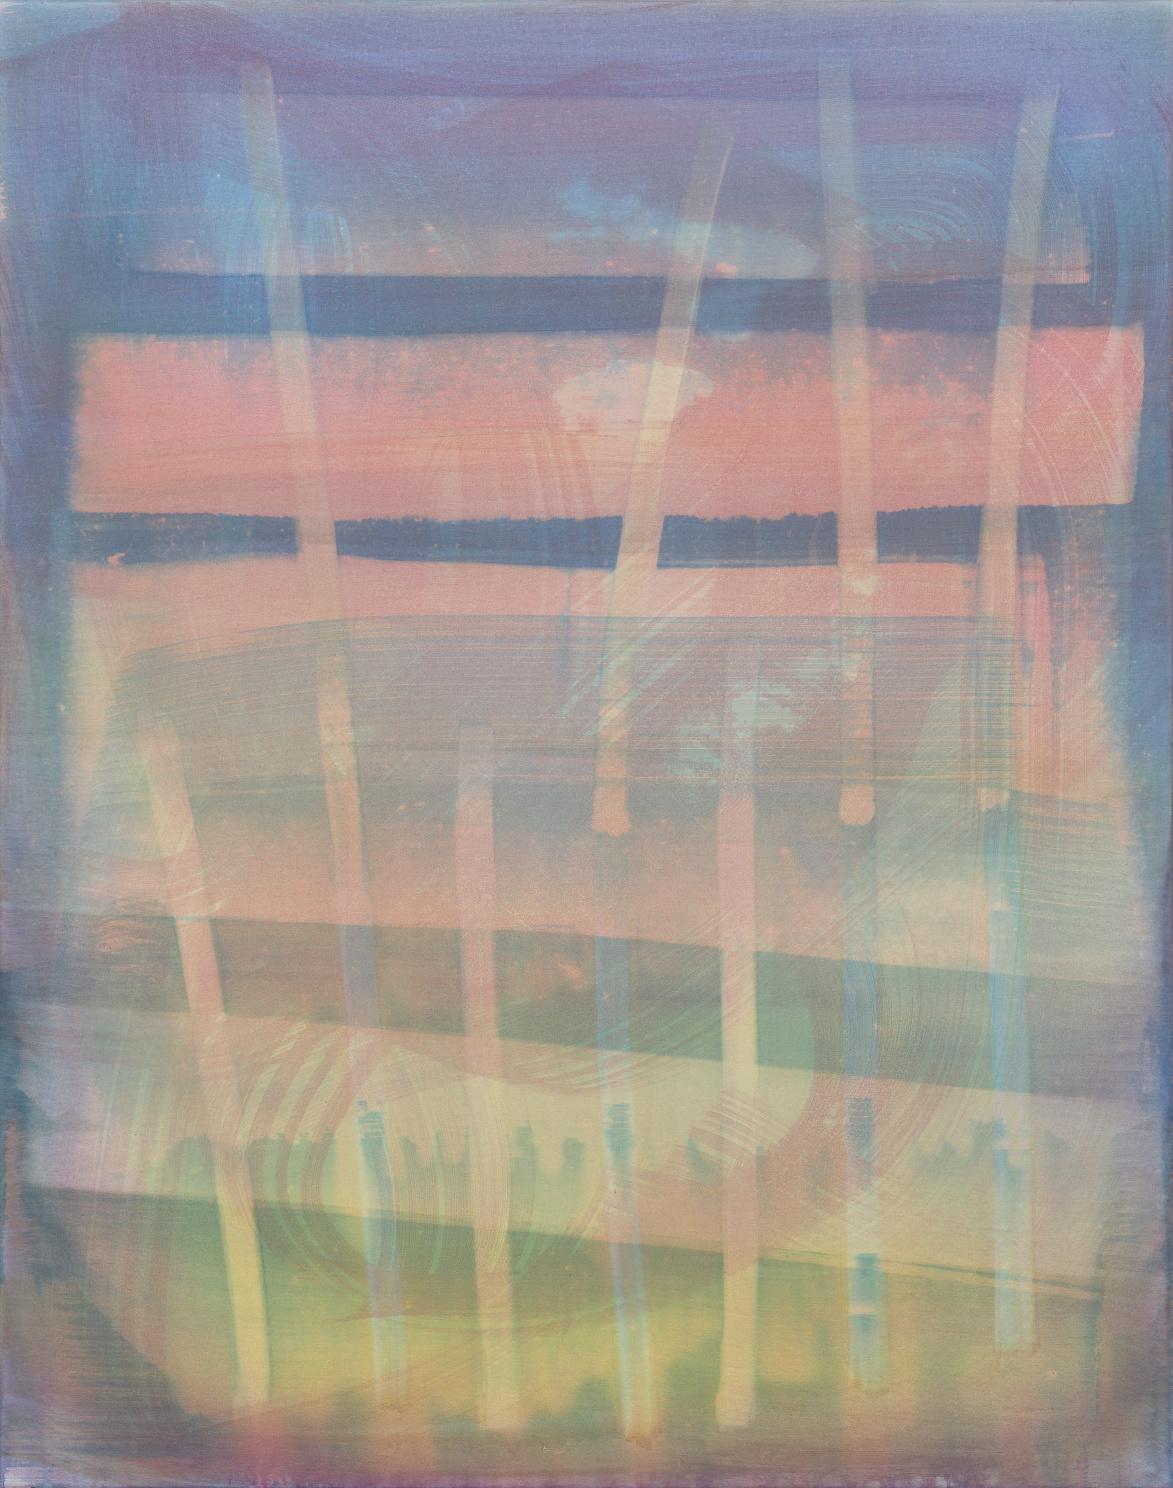 Ohne Titel [17182] | 2017 | Organic Preparation of Pigments on Canvas | 120 x 95 cm | ©Felix Büchel, Courtesy GALERIE ALBER